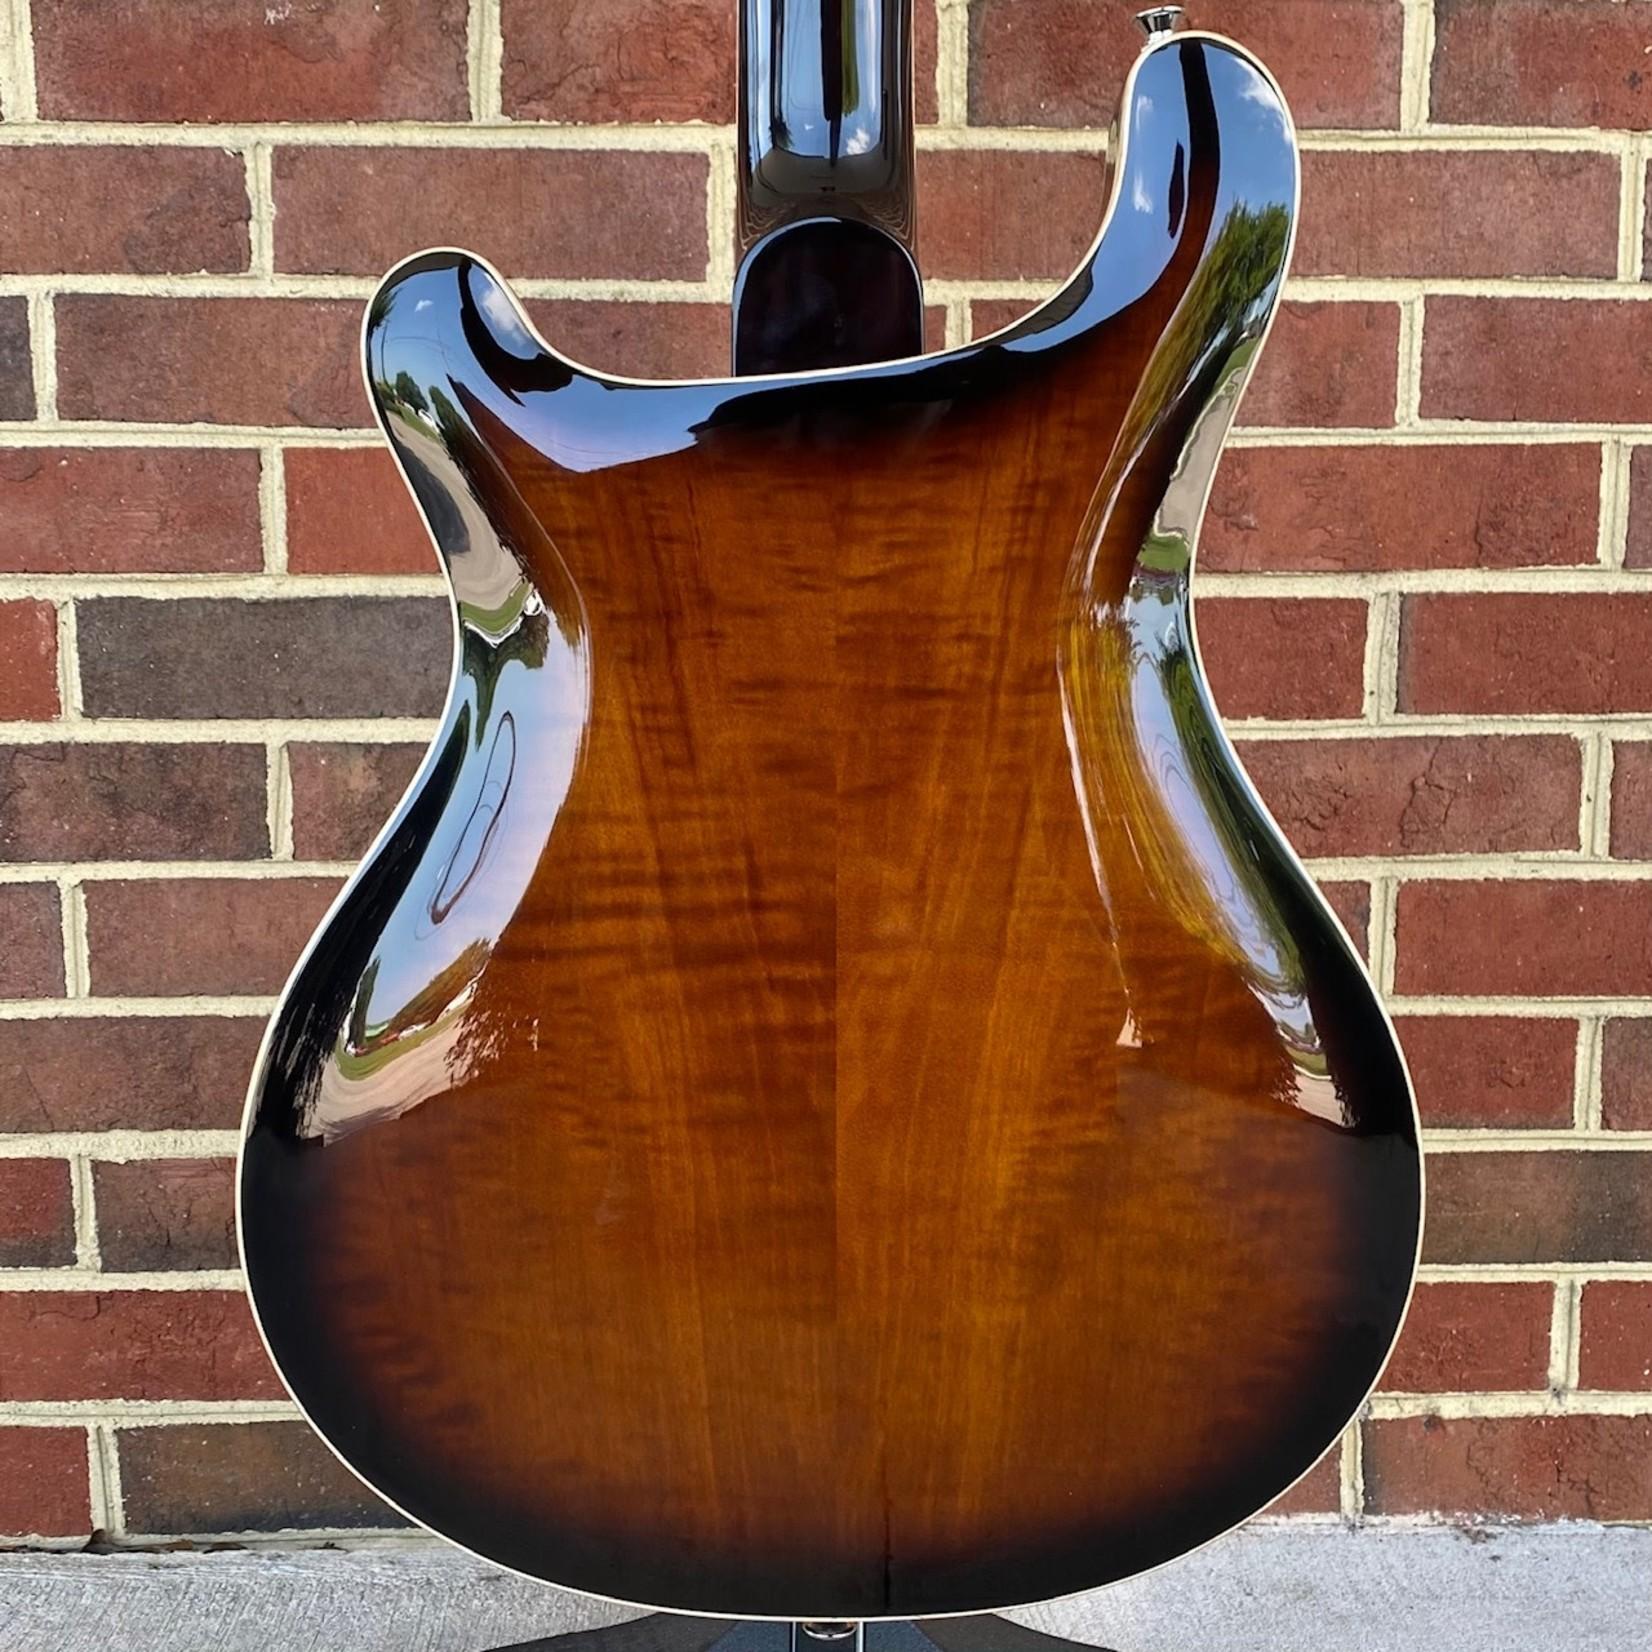 Paul Reed Smith Paul Reed Smith SE Hollowbody II Piezo, Black Gold, Ebony Fretboard, Hardshell Case